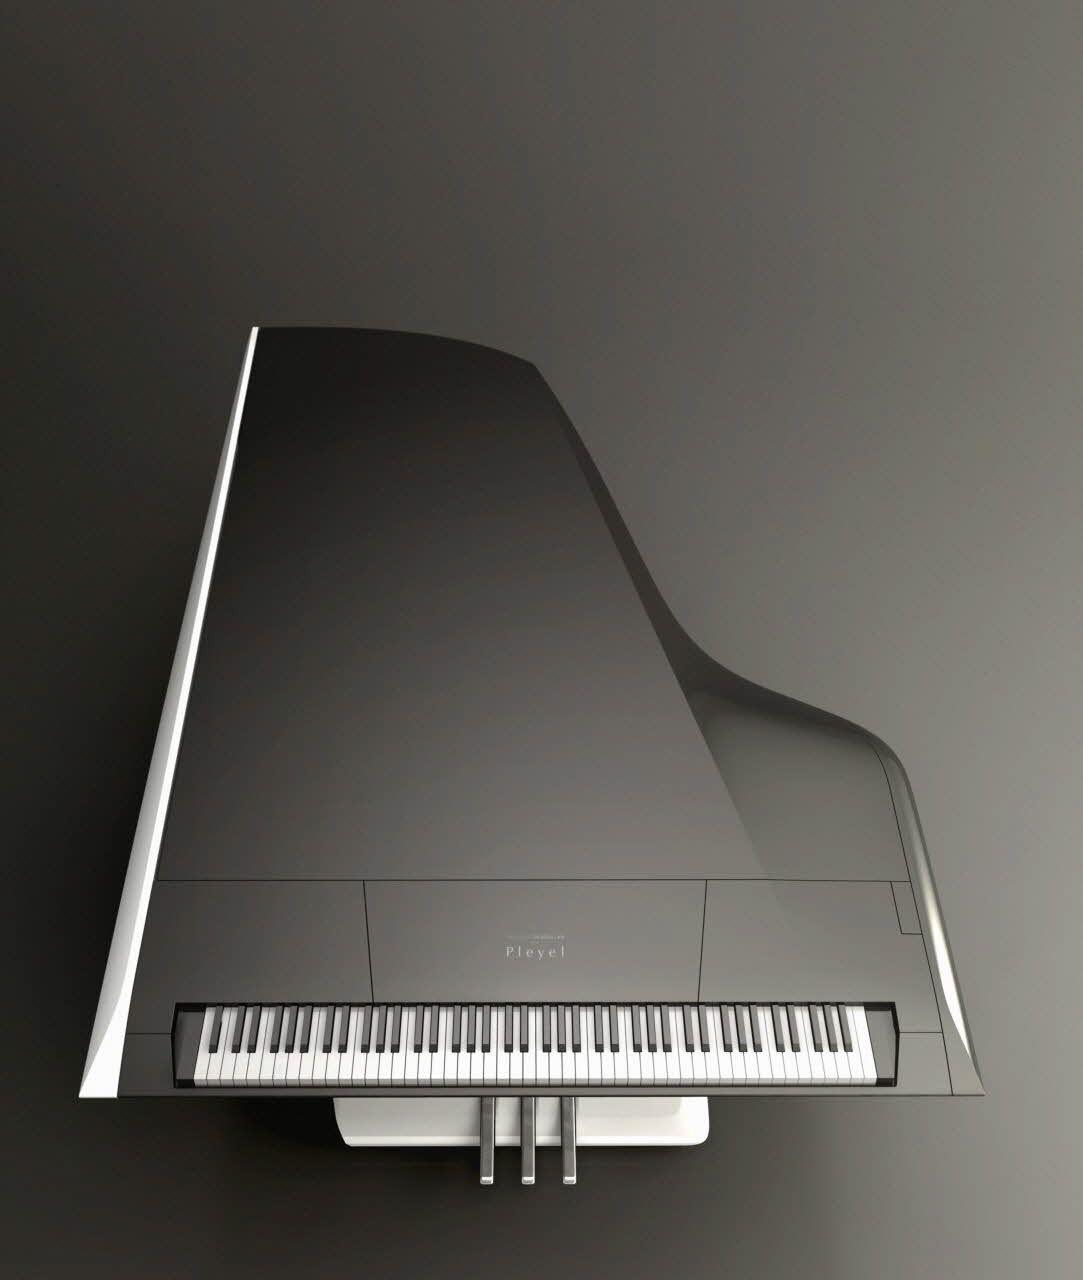 Pleyel Piano by Peugeot Design Lab